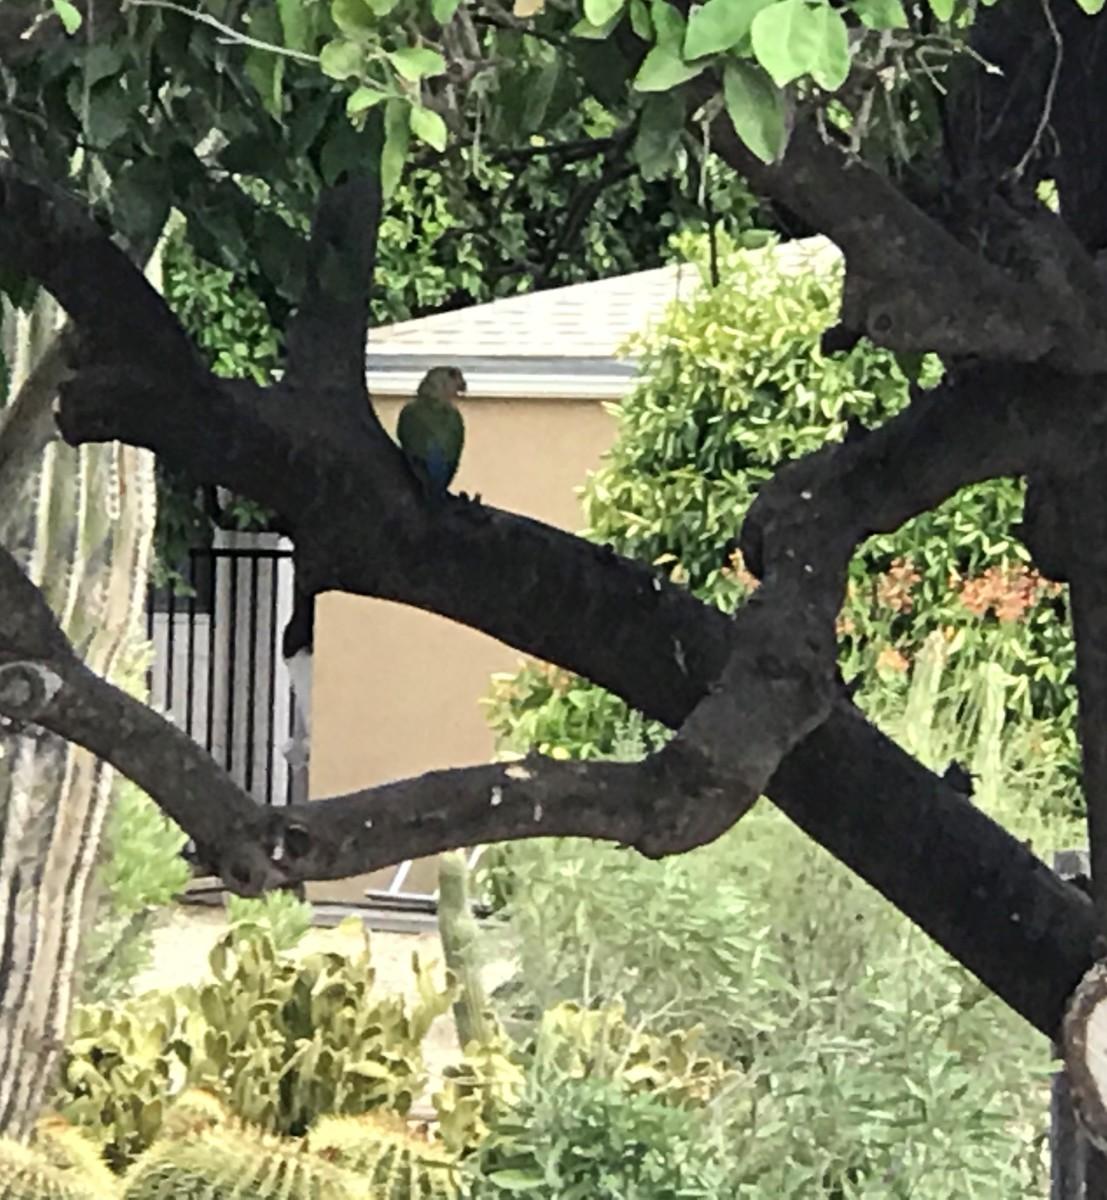 Parrots in Arizona?